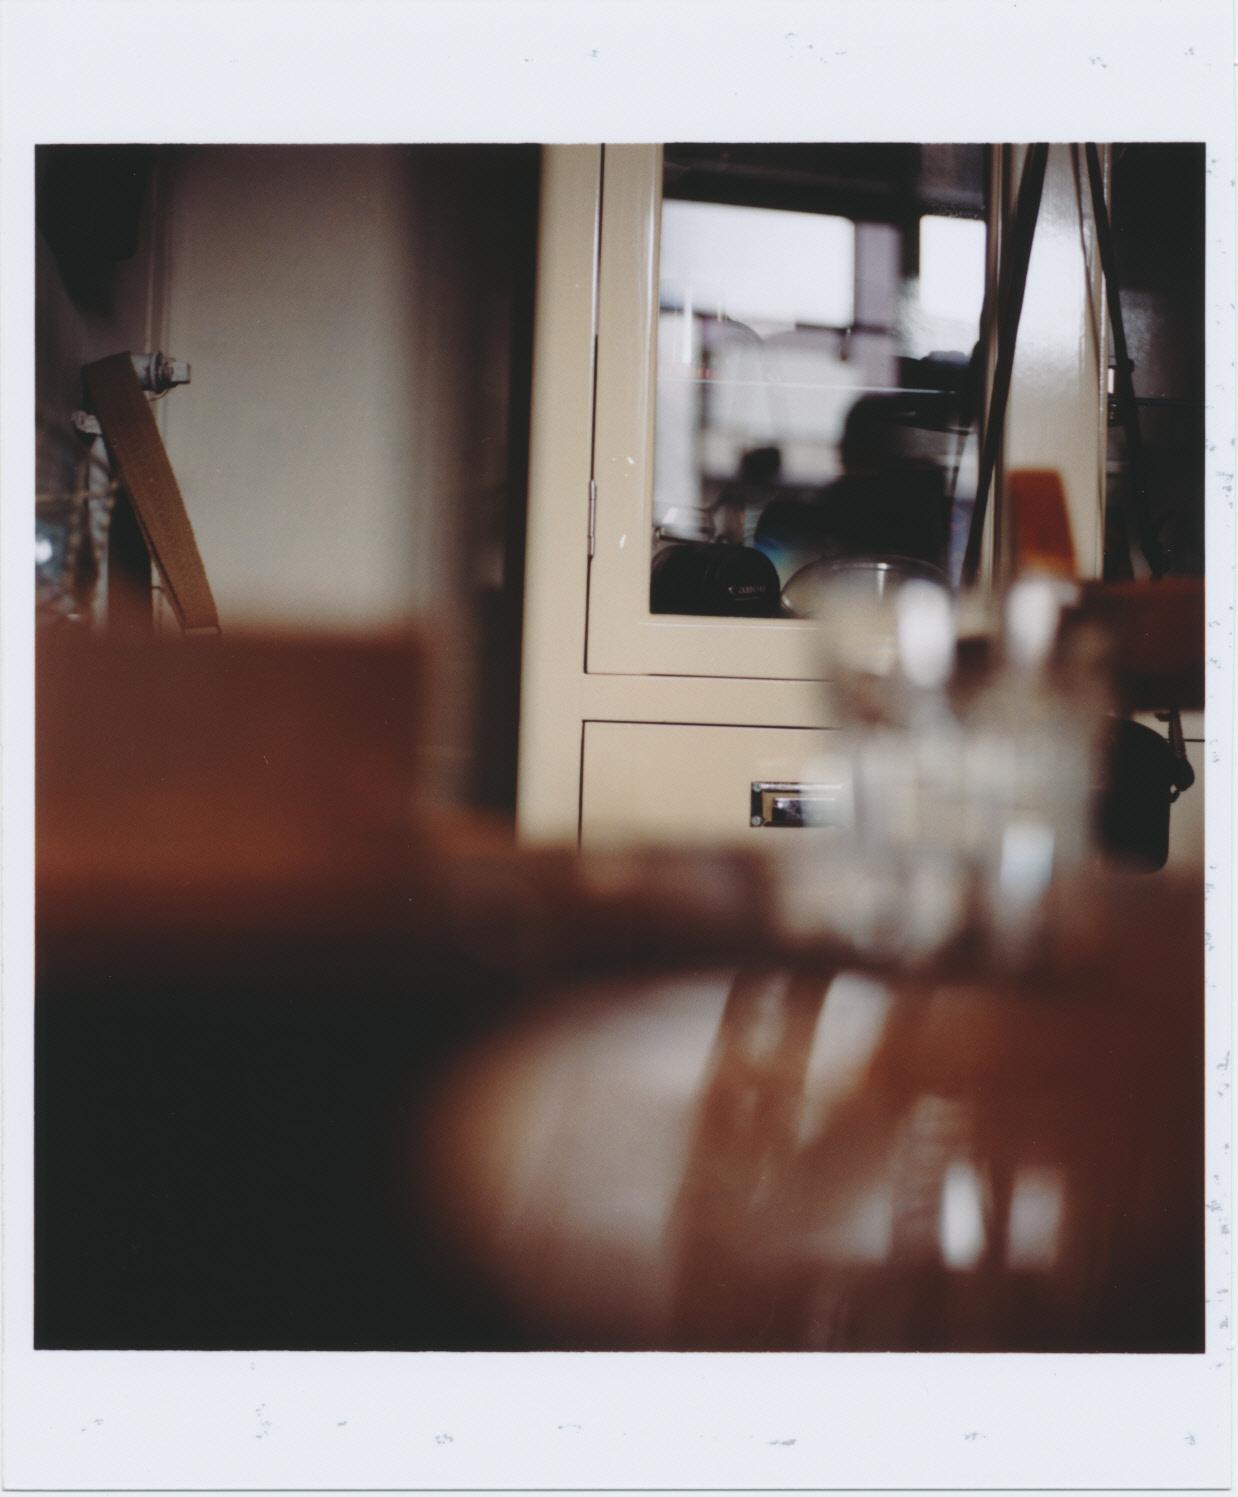 Kodak_PORTRA_400_0018